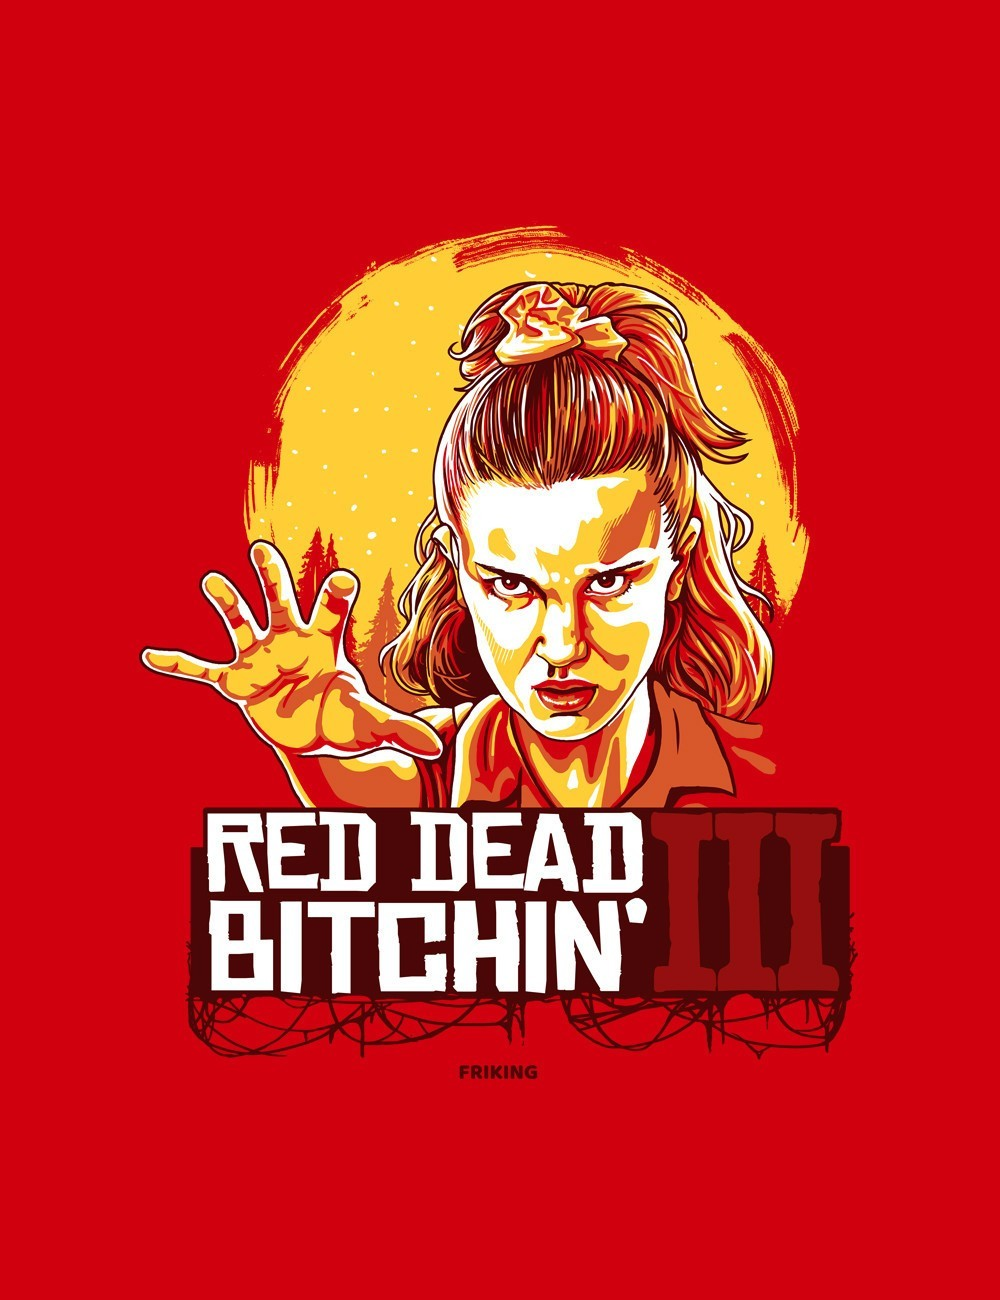 Red dead bitchin